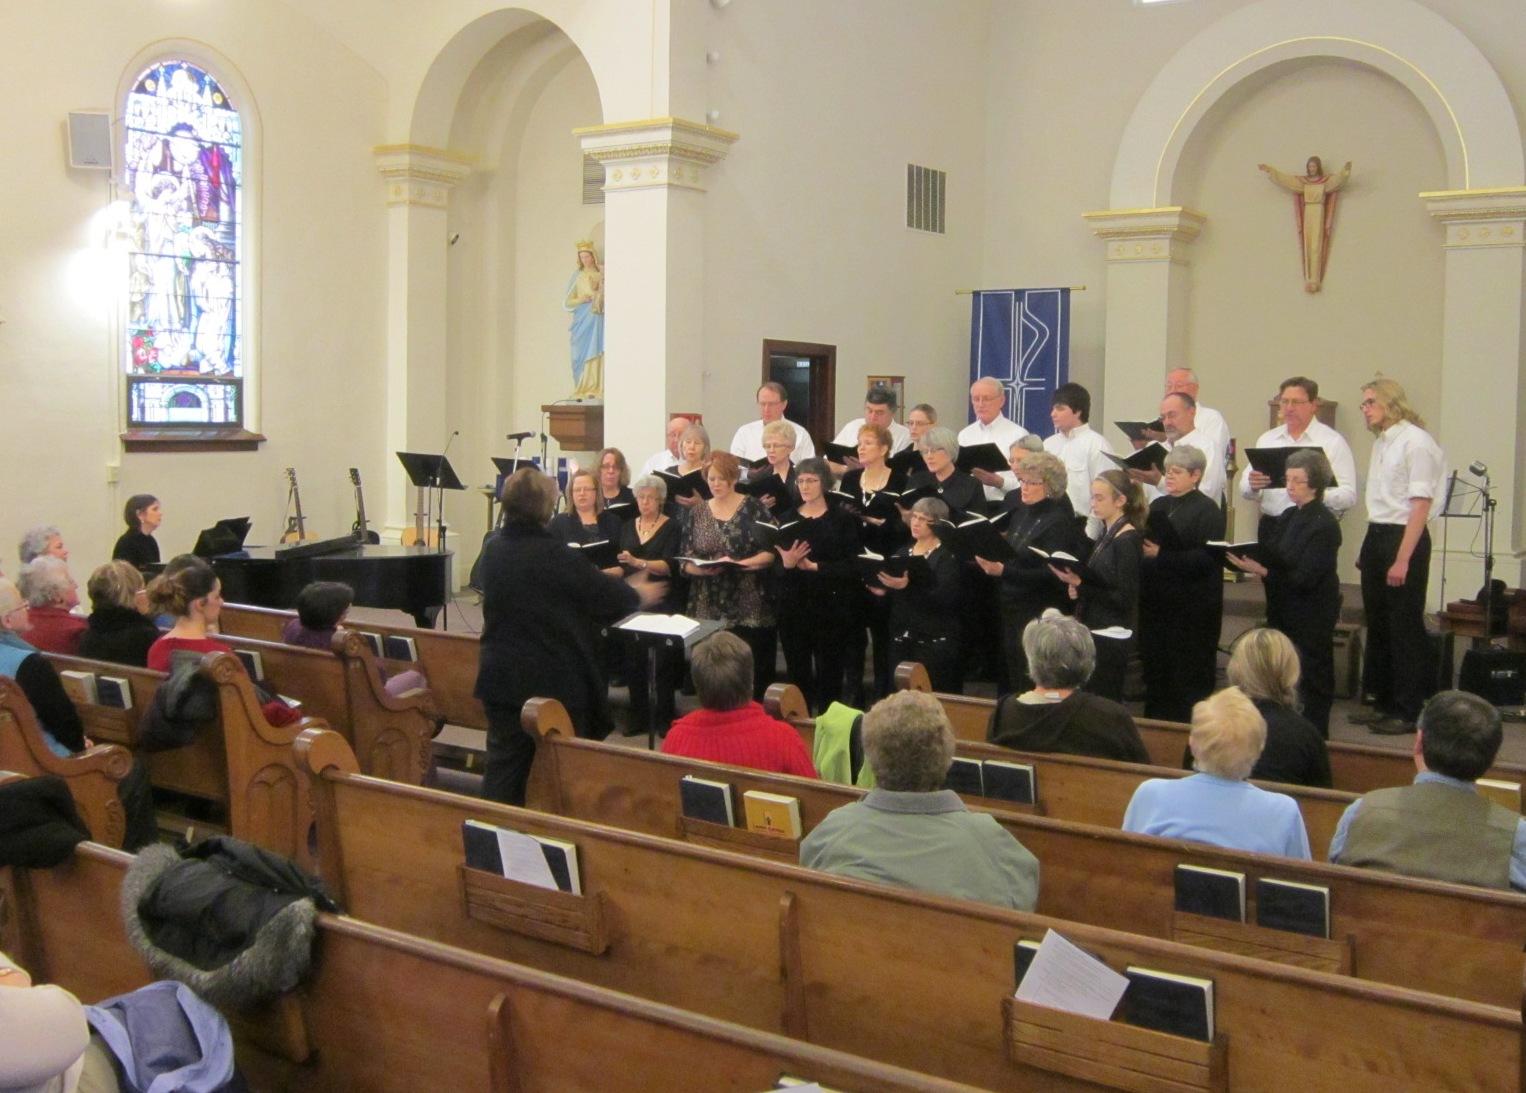 Chancel Choir FUMC 1.JPG